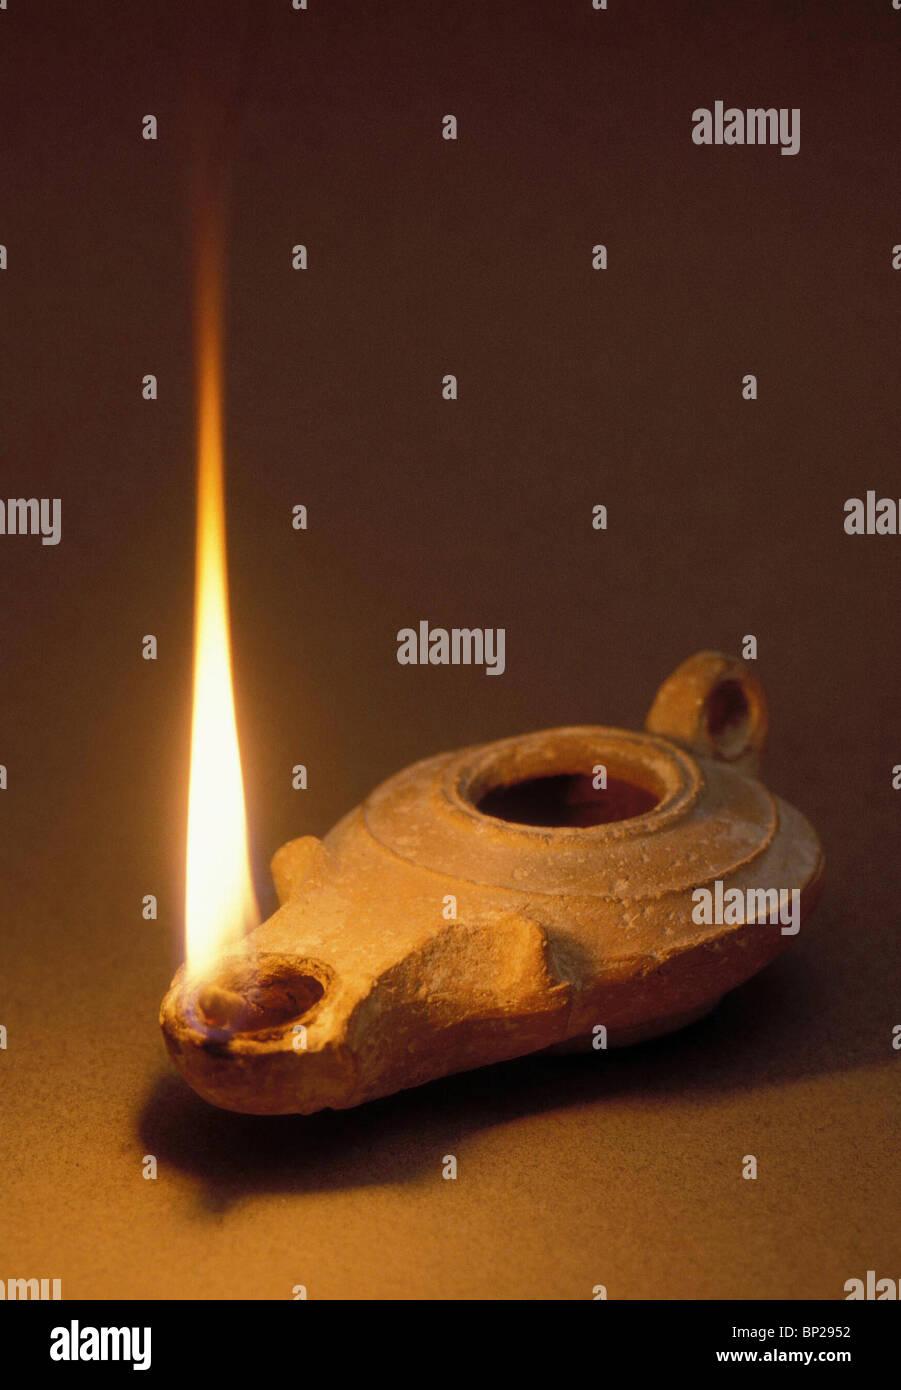 2641. Erodiano illuminato olio lampada Immagini Stock